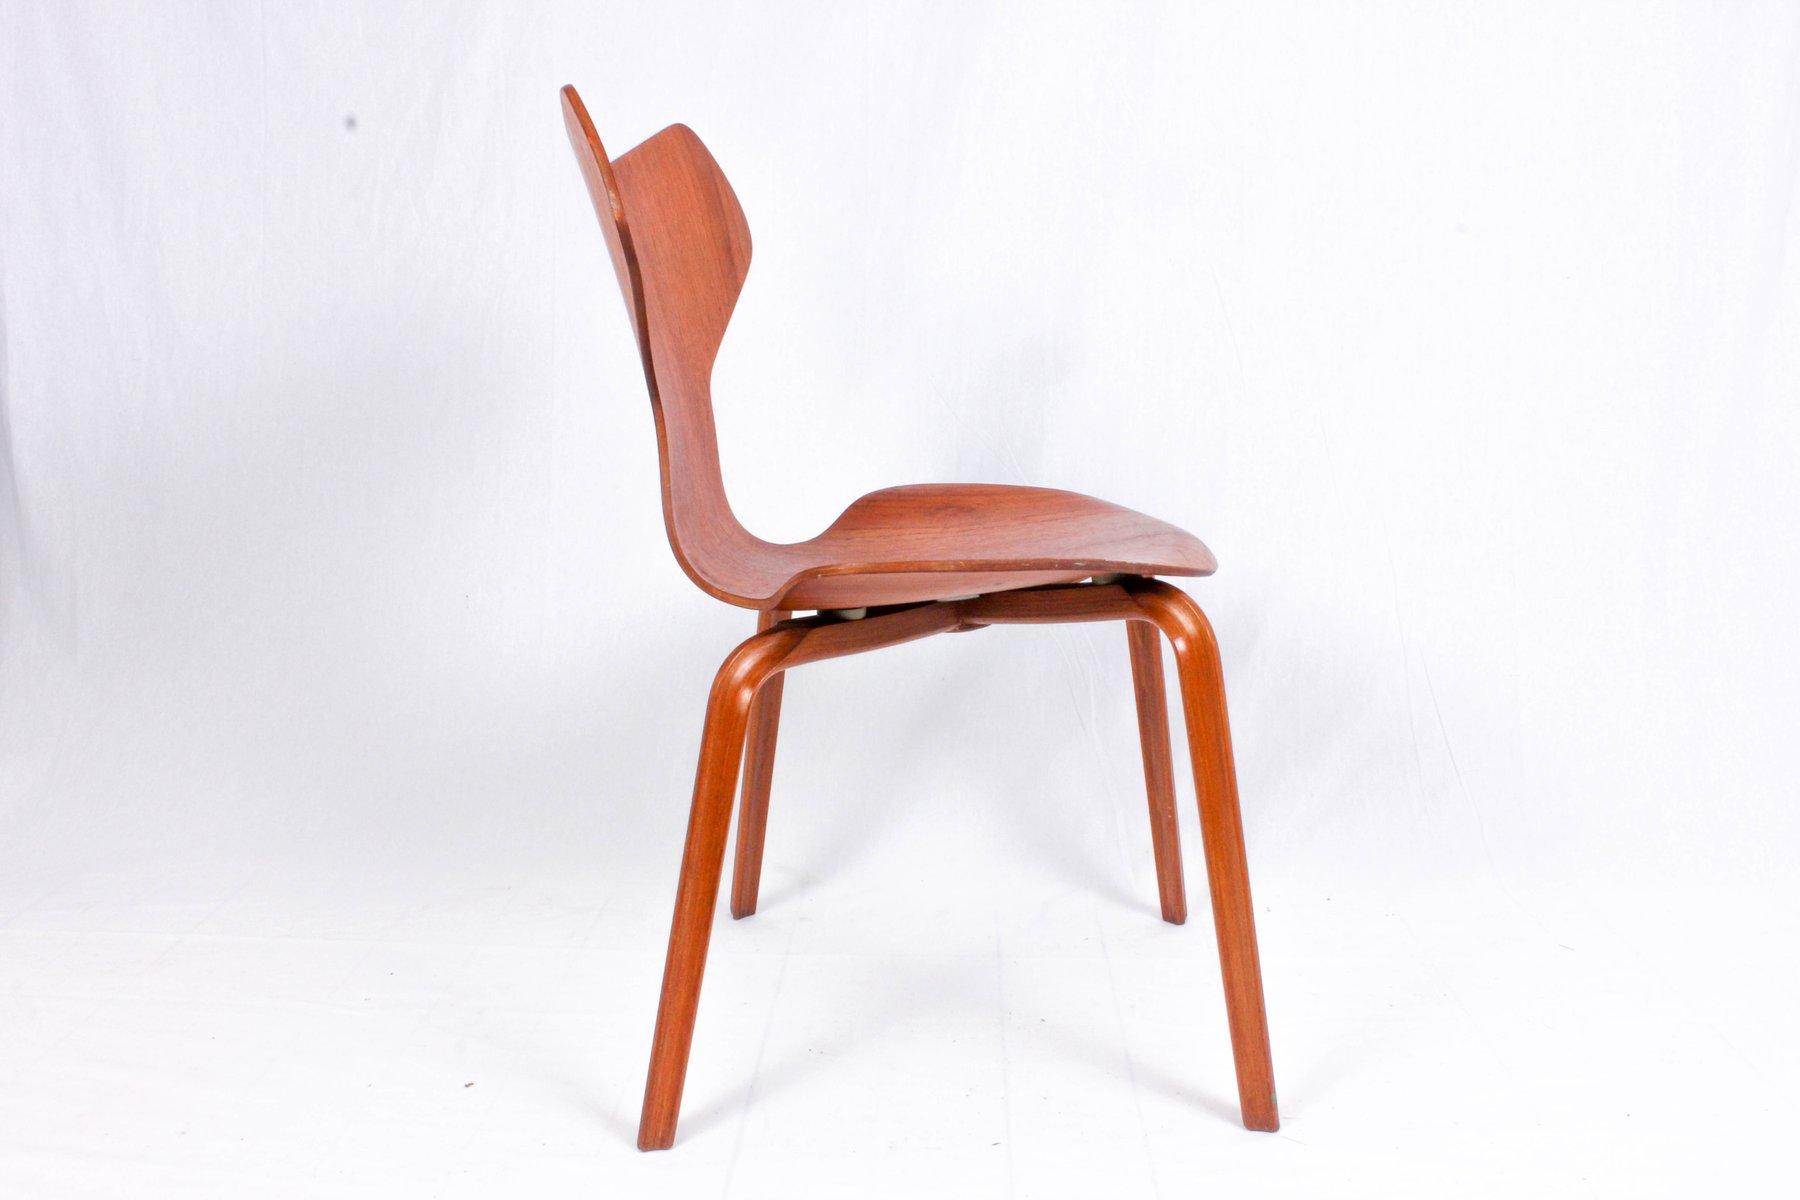 modell 3130 stuhl von arne jacobsen f r fritz hansen 1964. Black Bedroom Furniture Sets. Home Design Ideas